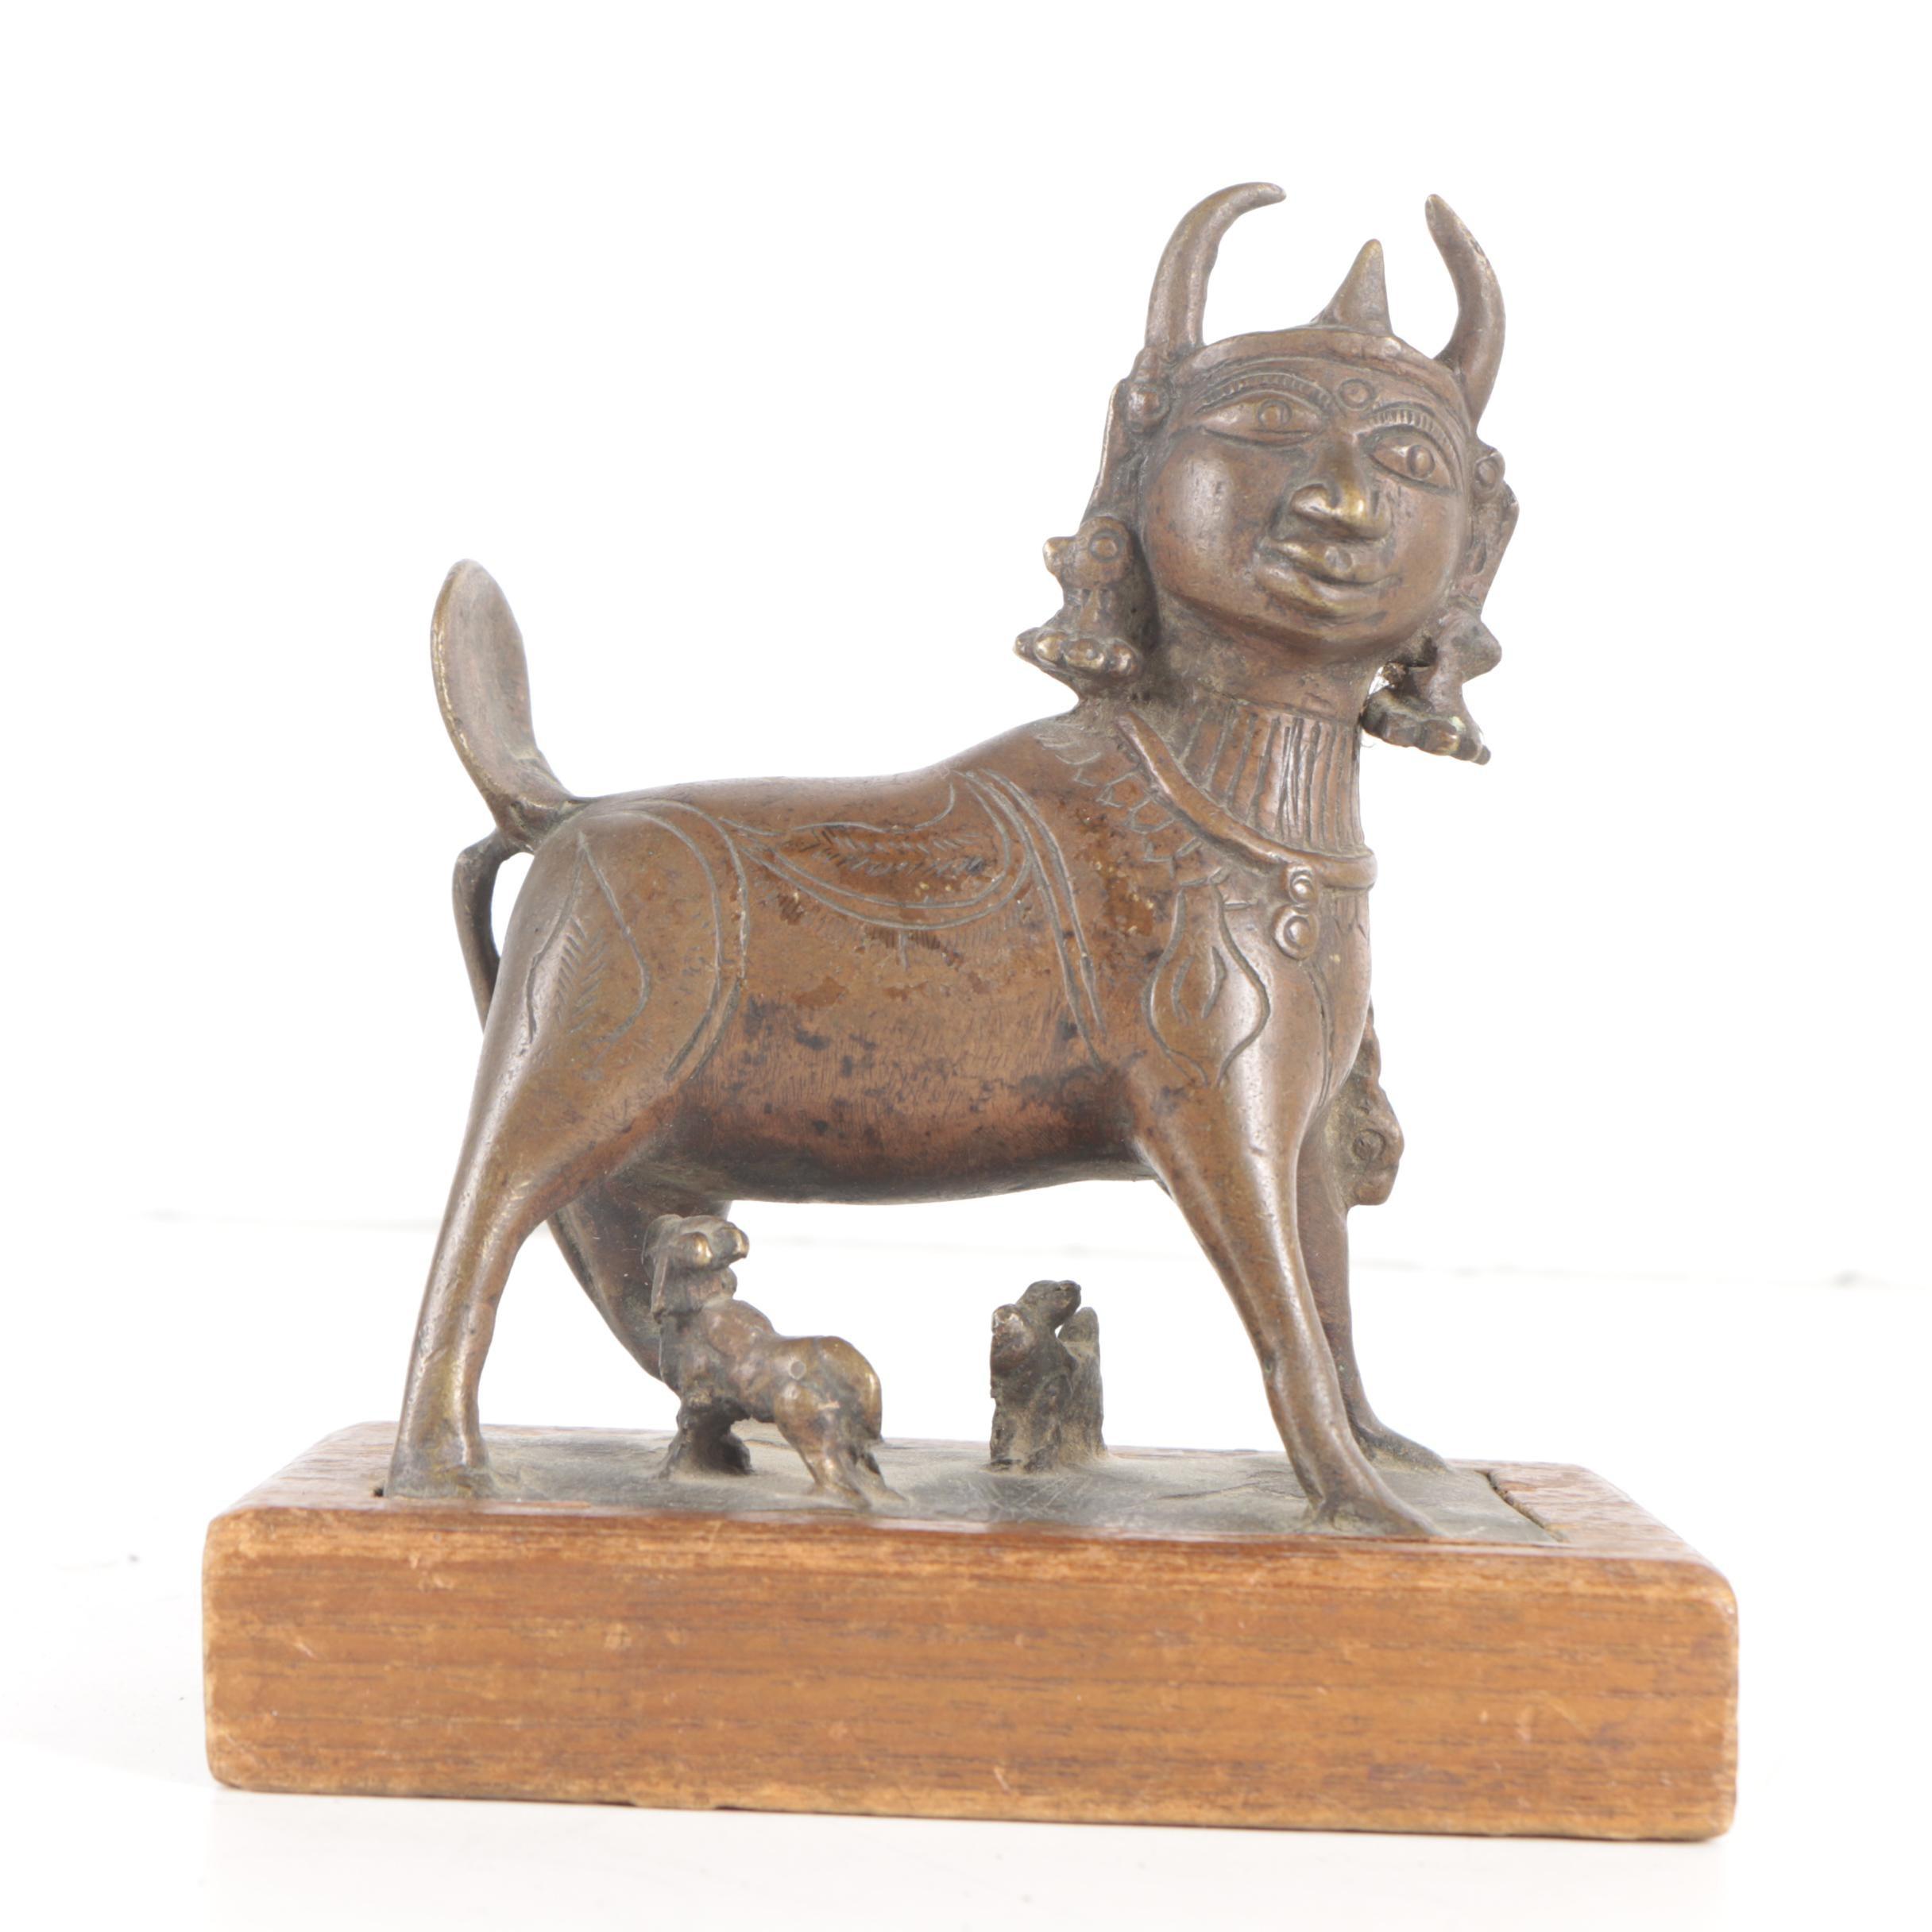 Brass Sculpture of Kamadhenu Hindu Bovine Goddess